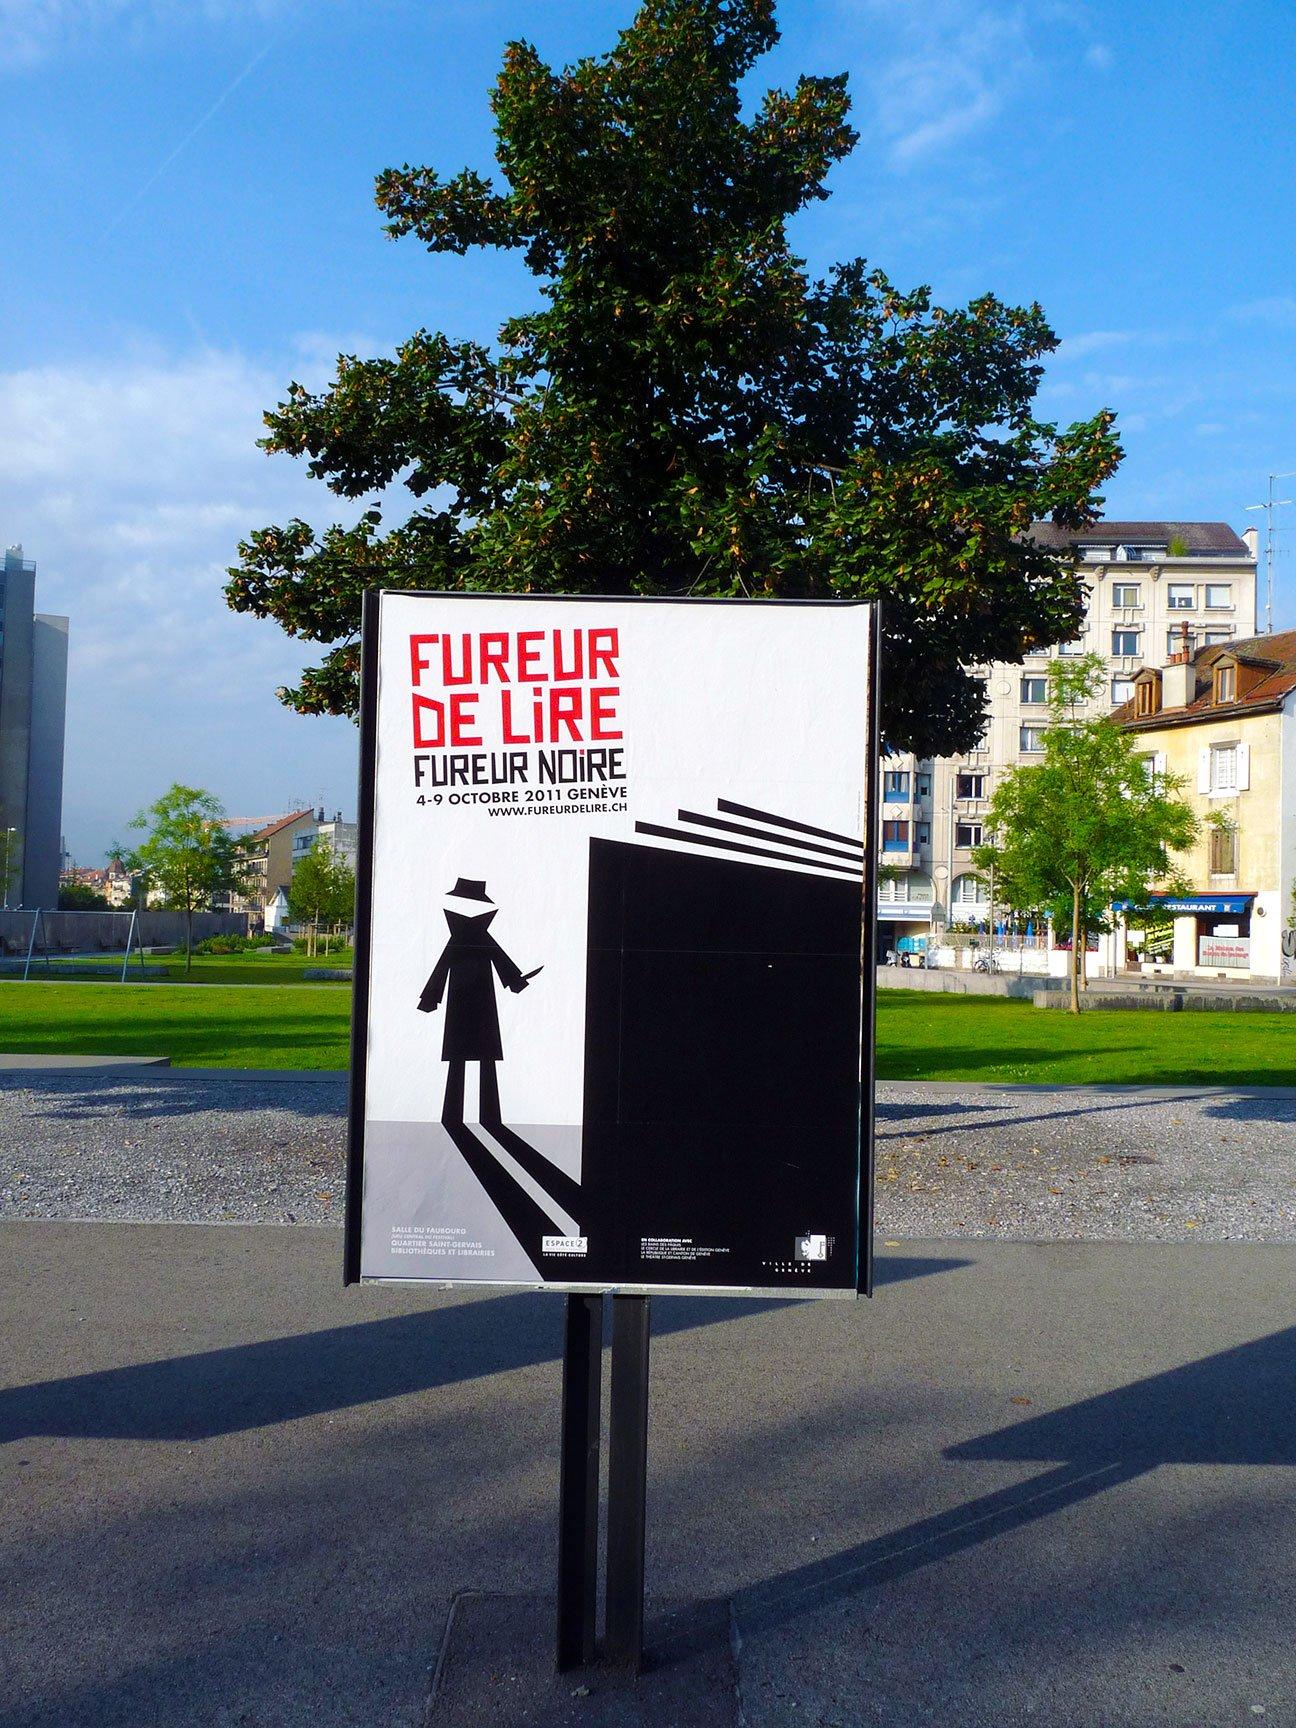 fabien_cuffel_festival_litteraire_fureur_lire_2011_Affiche